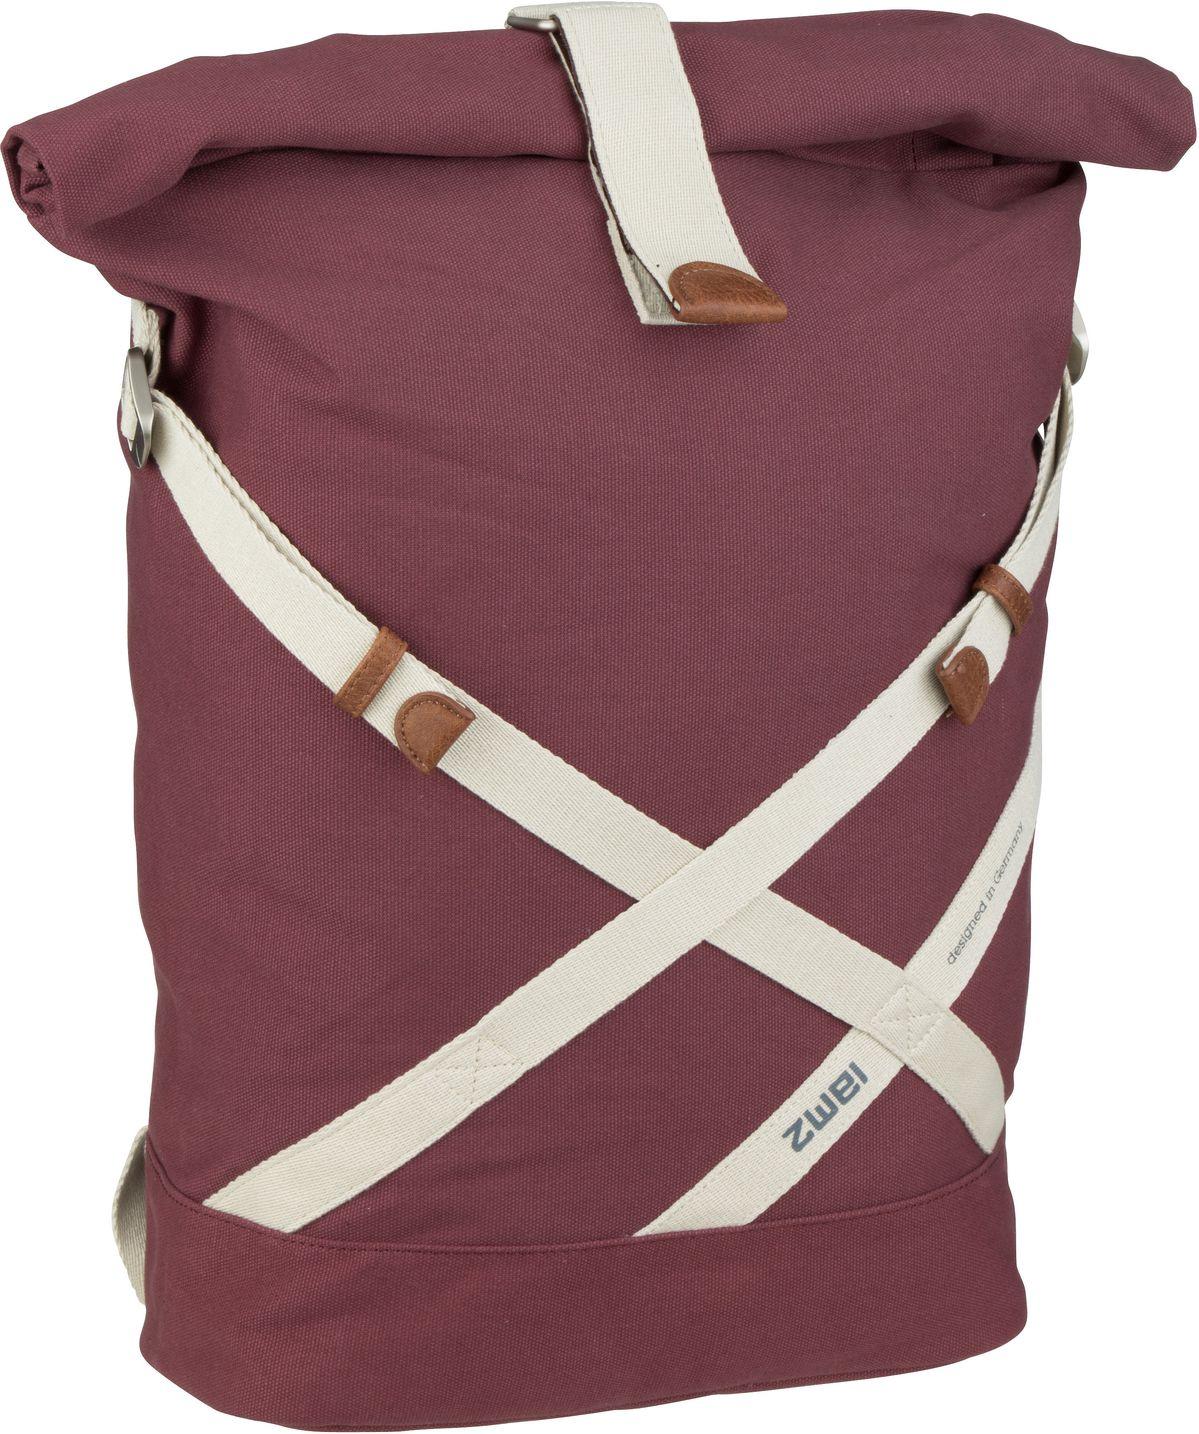 Rucksack / Daypack Yoga YR250 Blood (17 Liter)